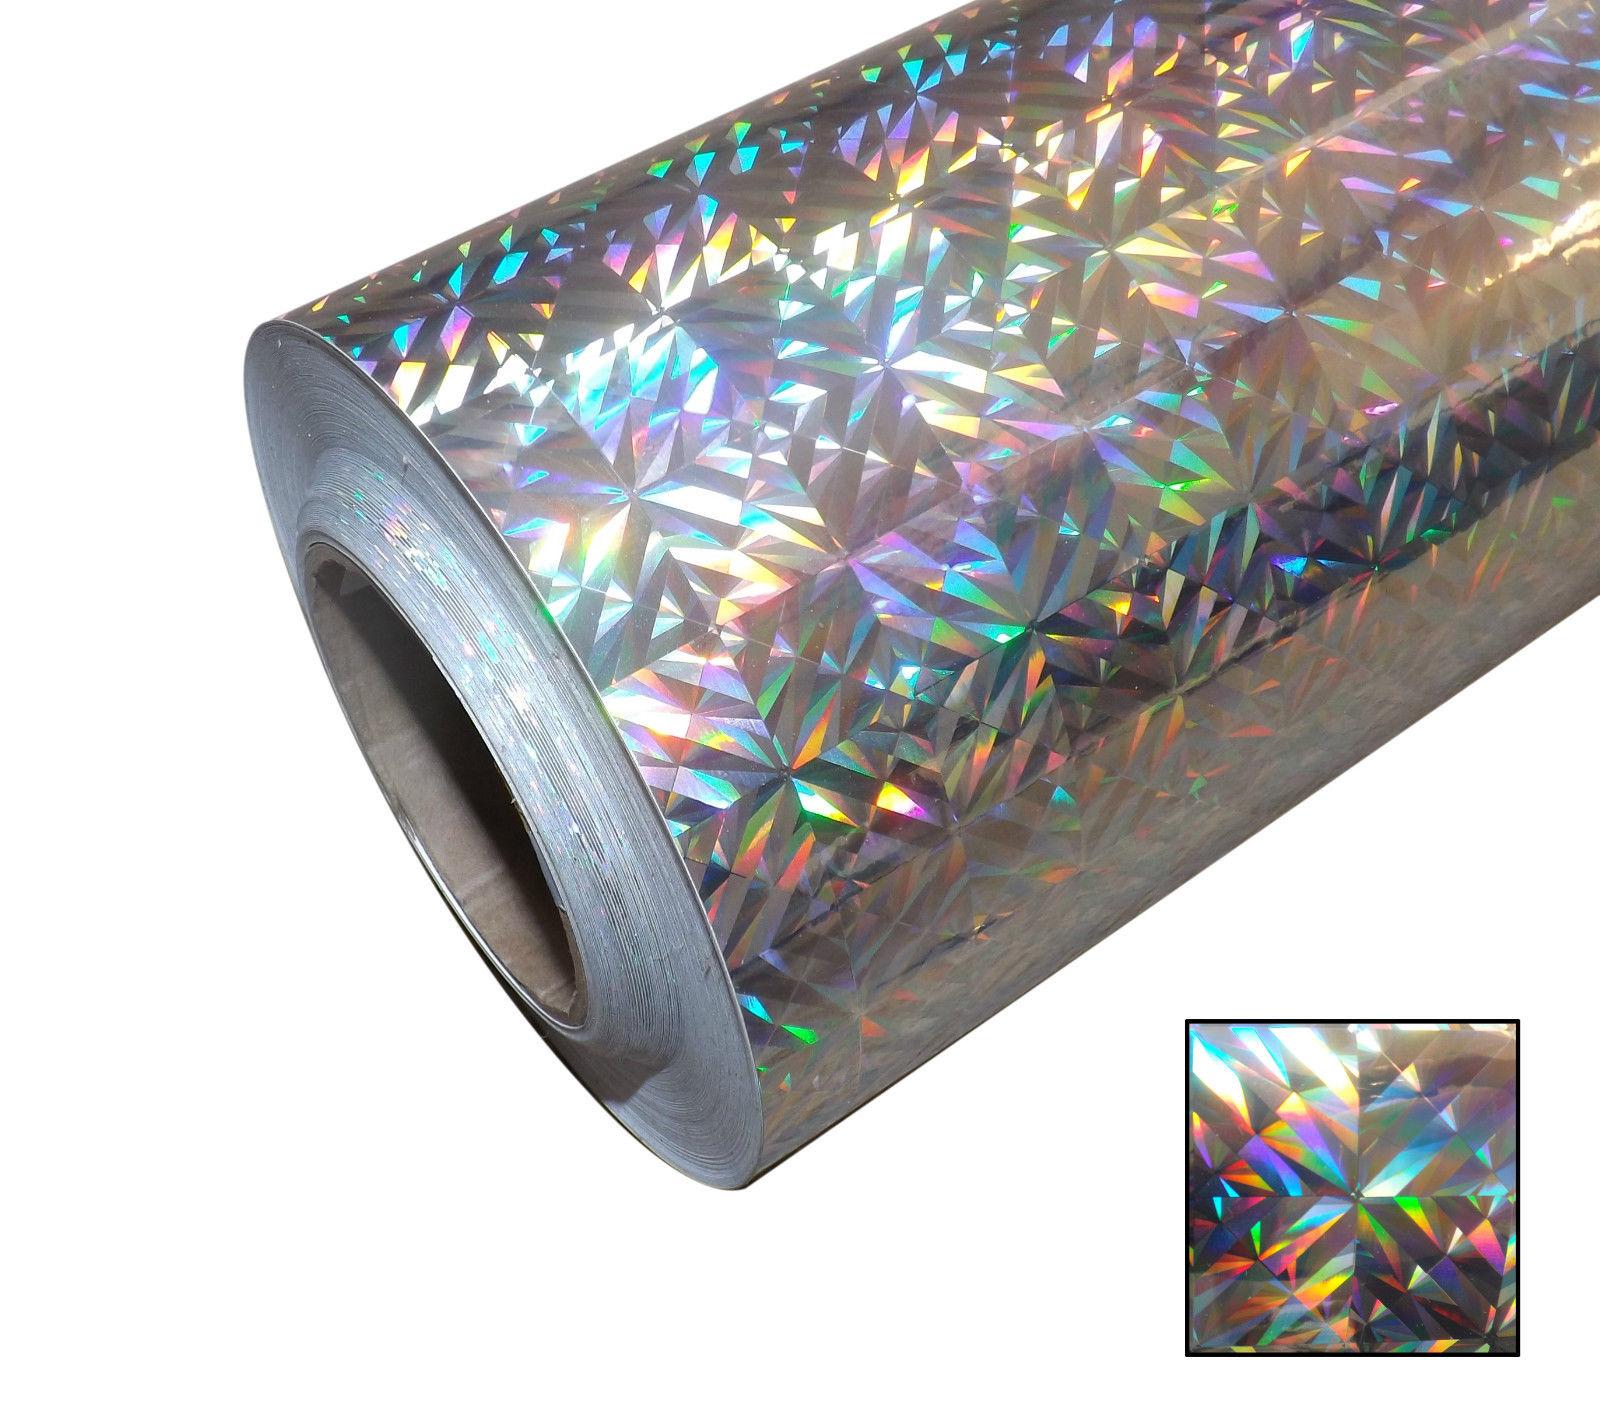 Hot Sell High Tenacity Metallic Vinyl Holographic Film